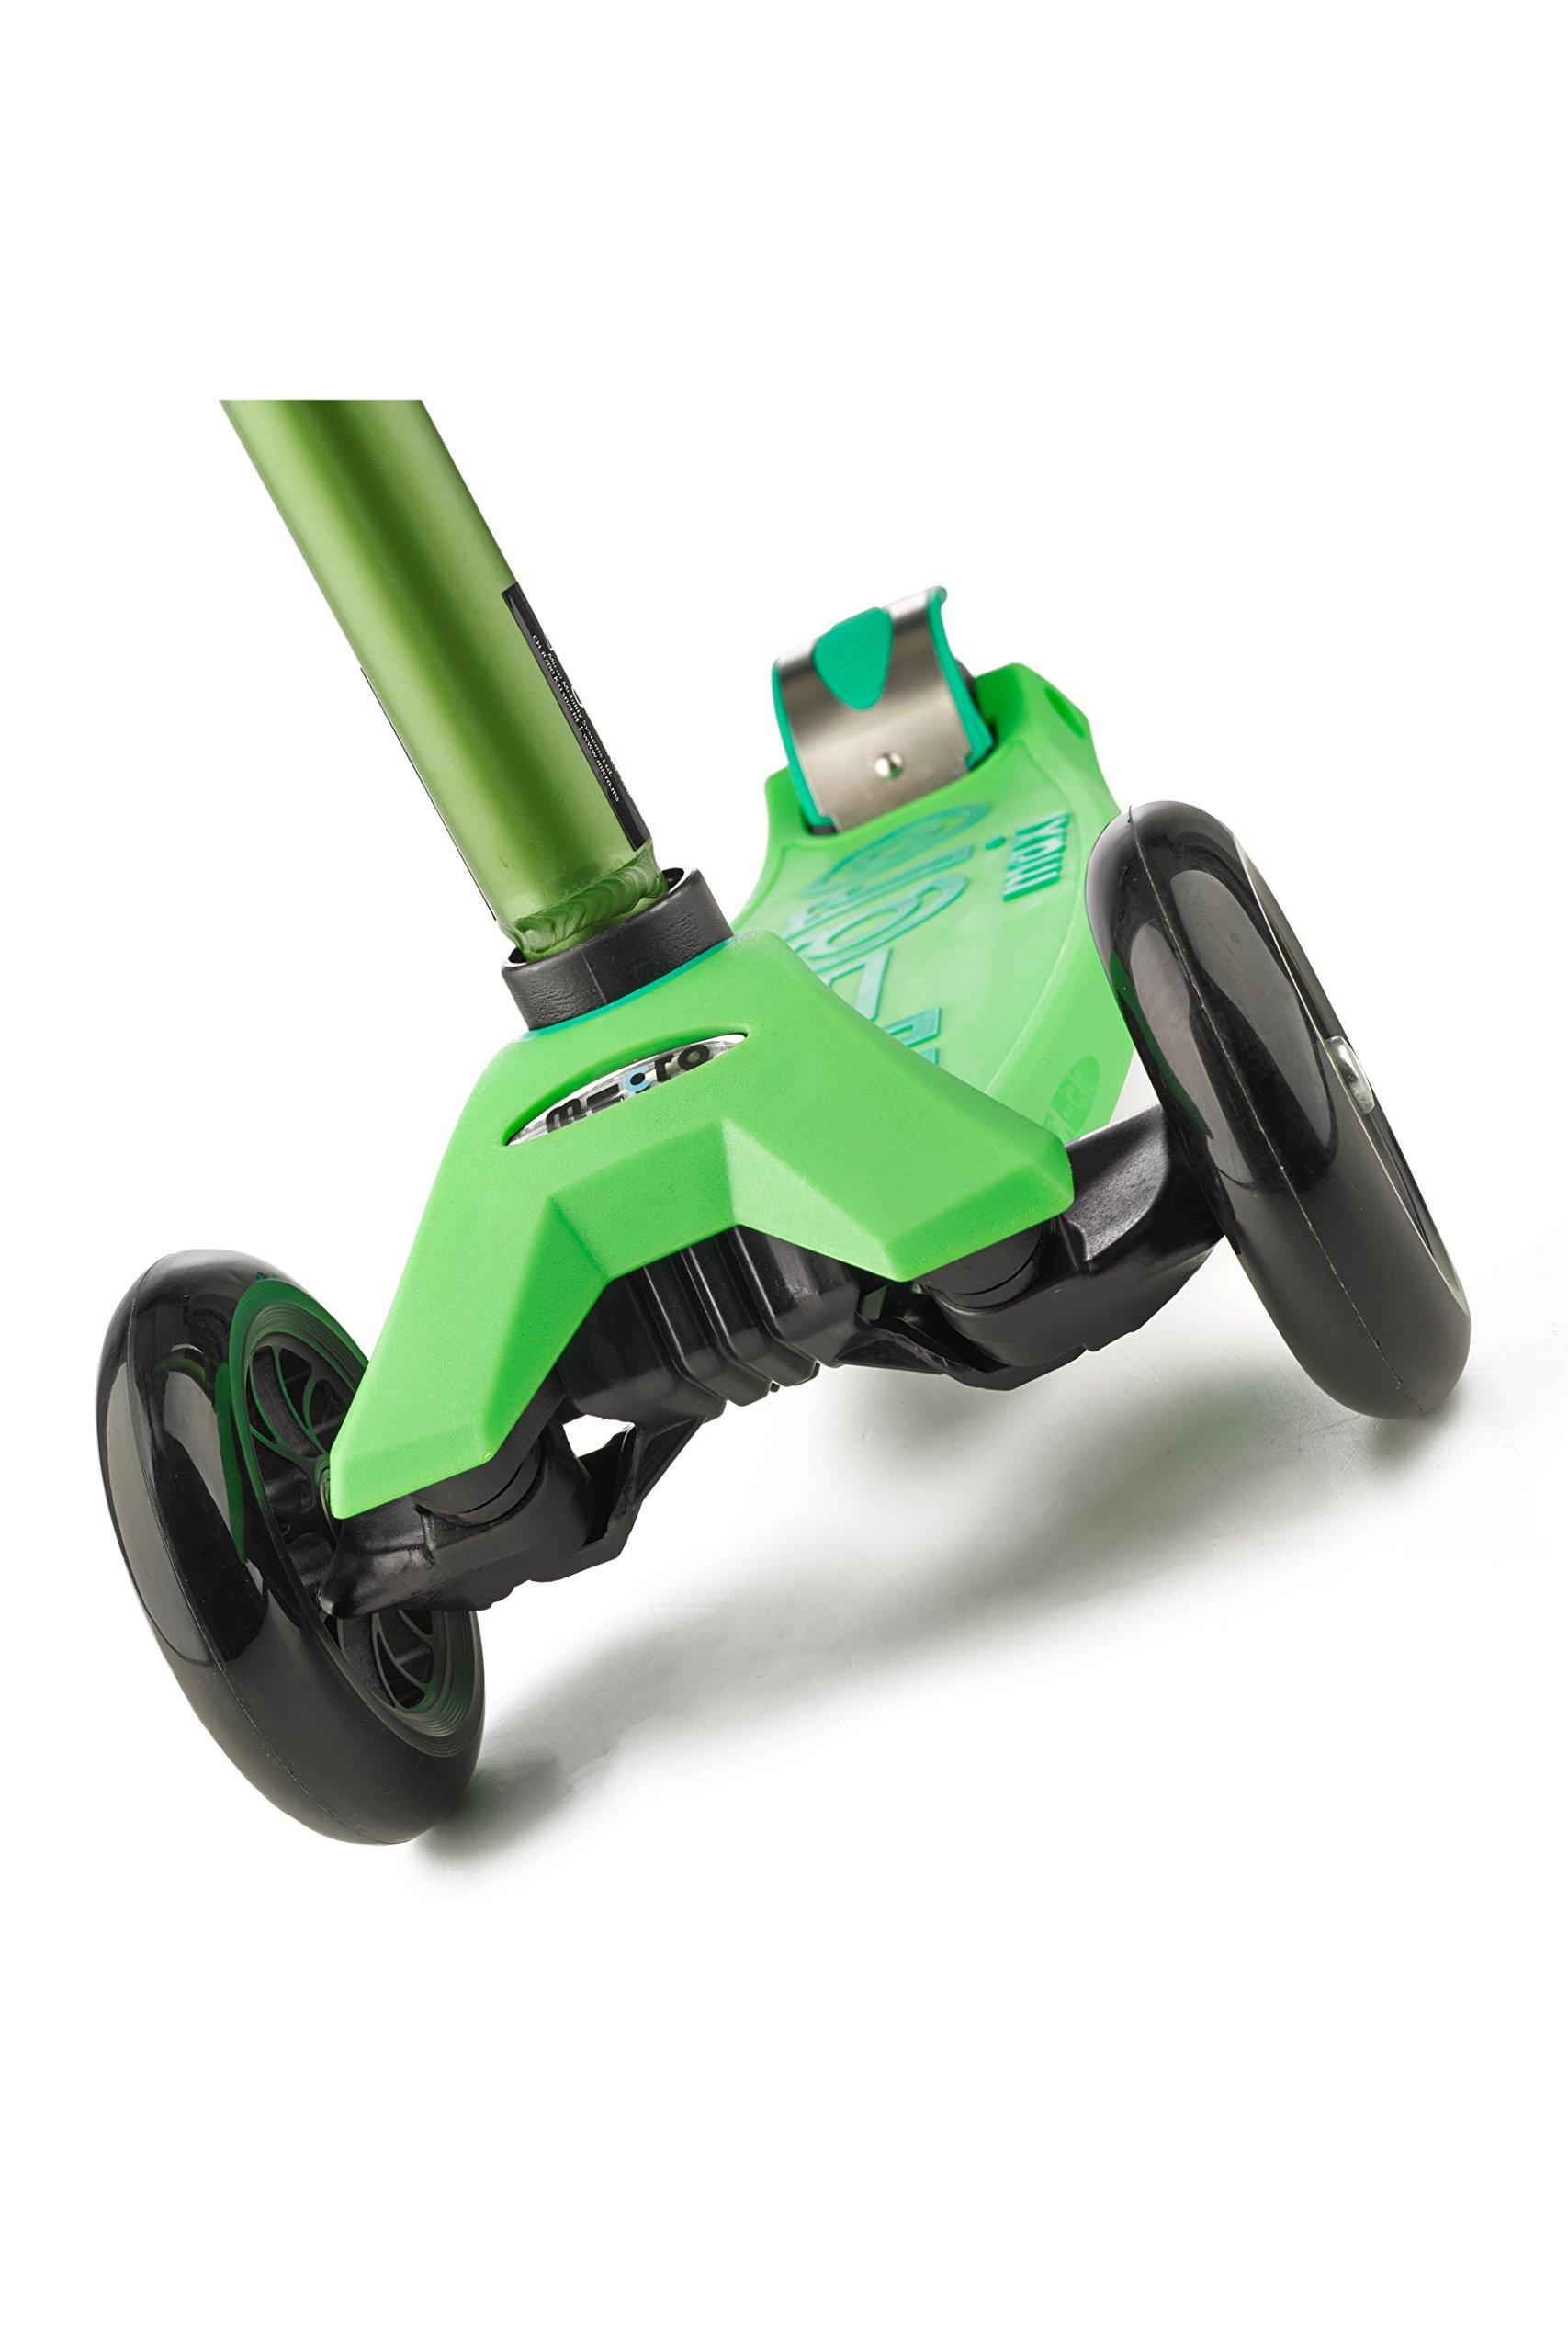 Micro Maxi Deluxe Kick Scooters (Green) by Micro Kickboard (Image #10)